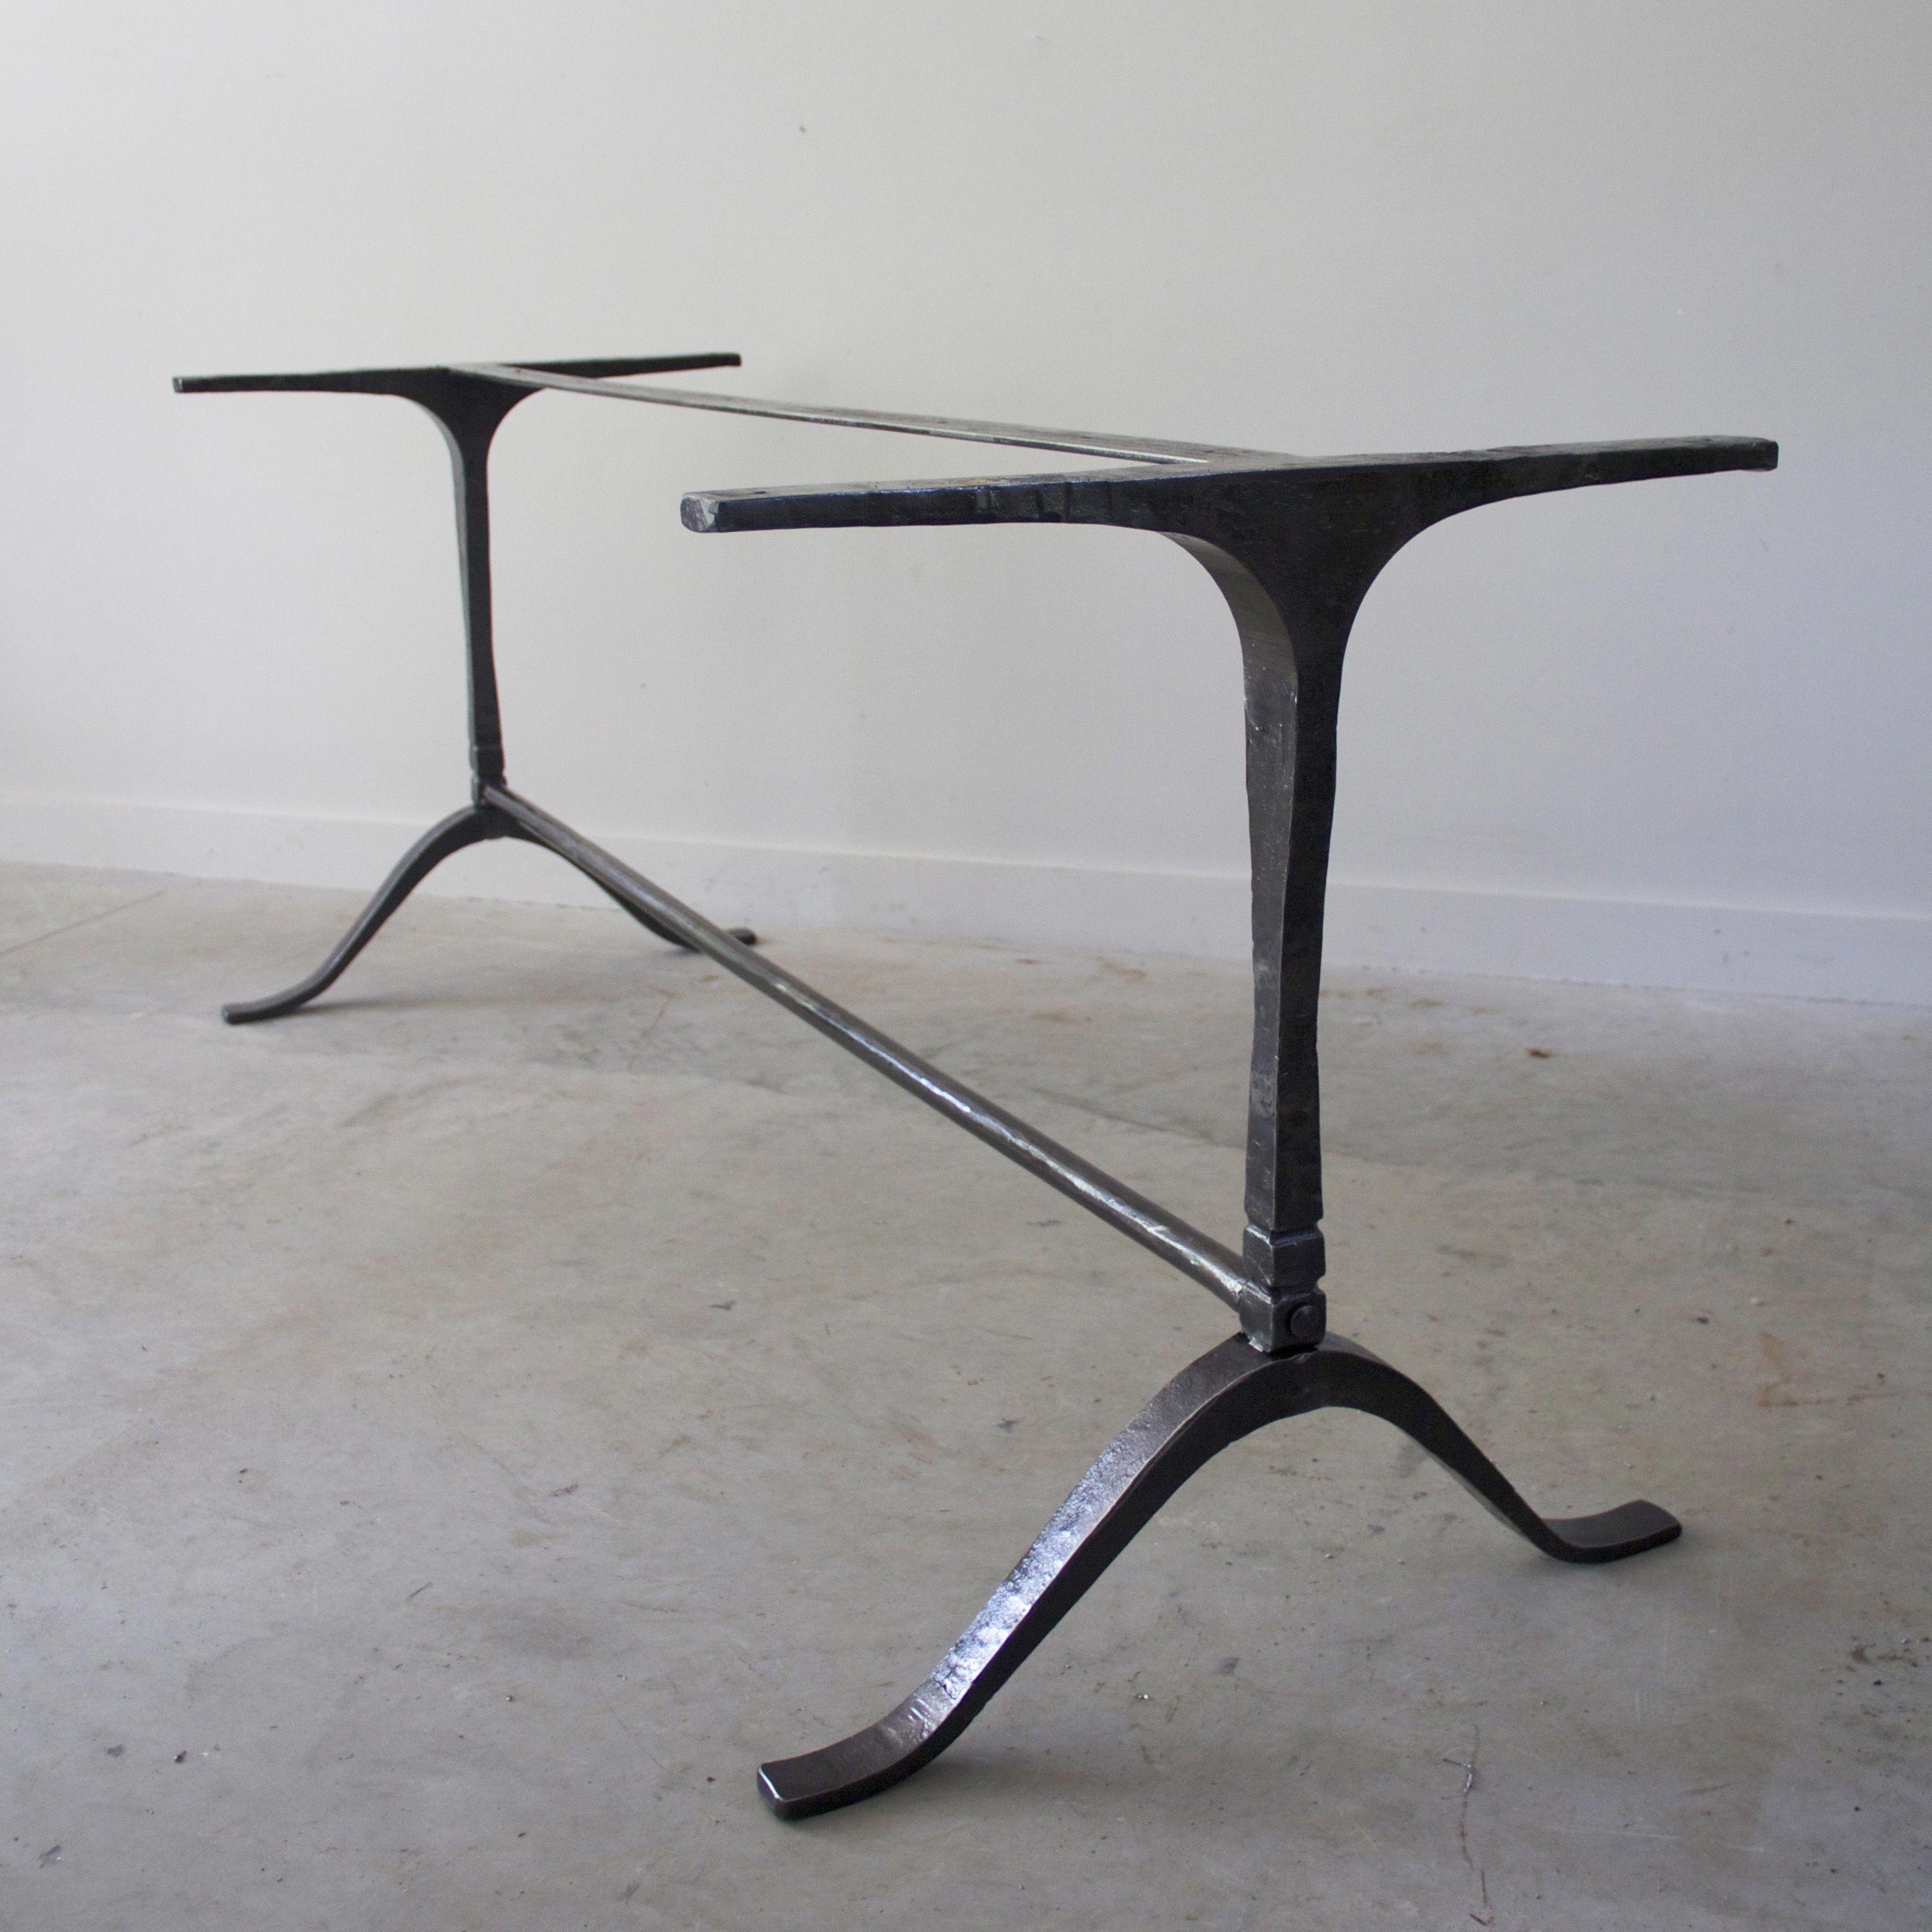 Muebles De Diseno Arte De Aprender Disenodelvector Wrought Iron Table Legs Iron Base Table Cast Iron Table Base